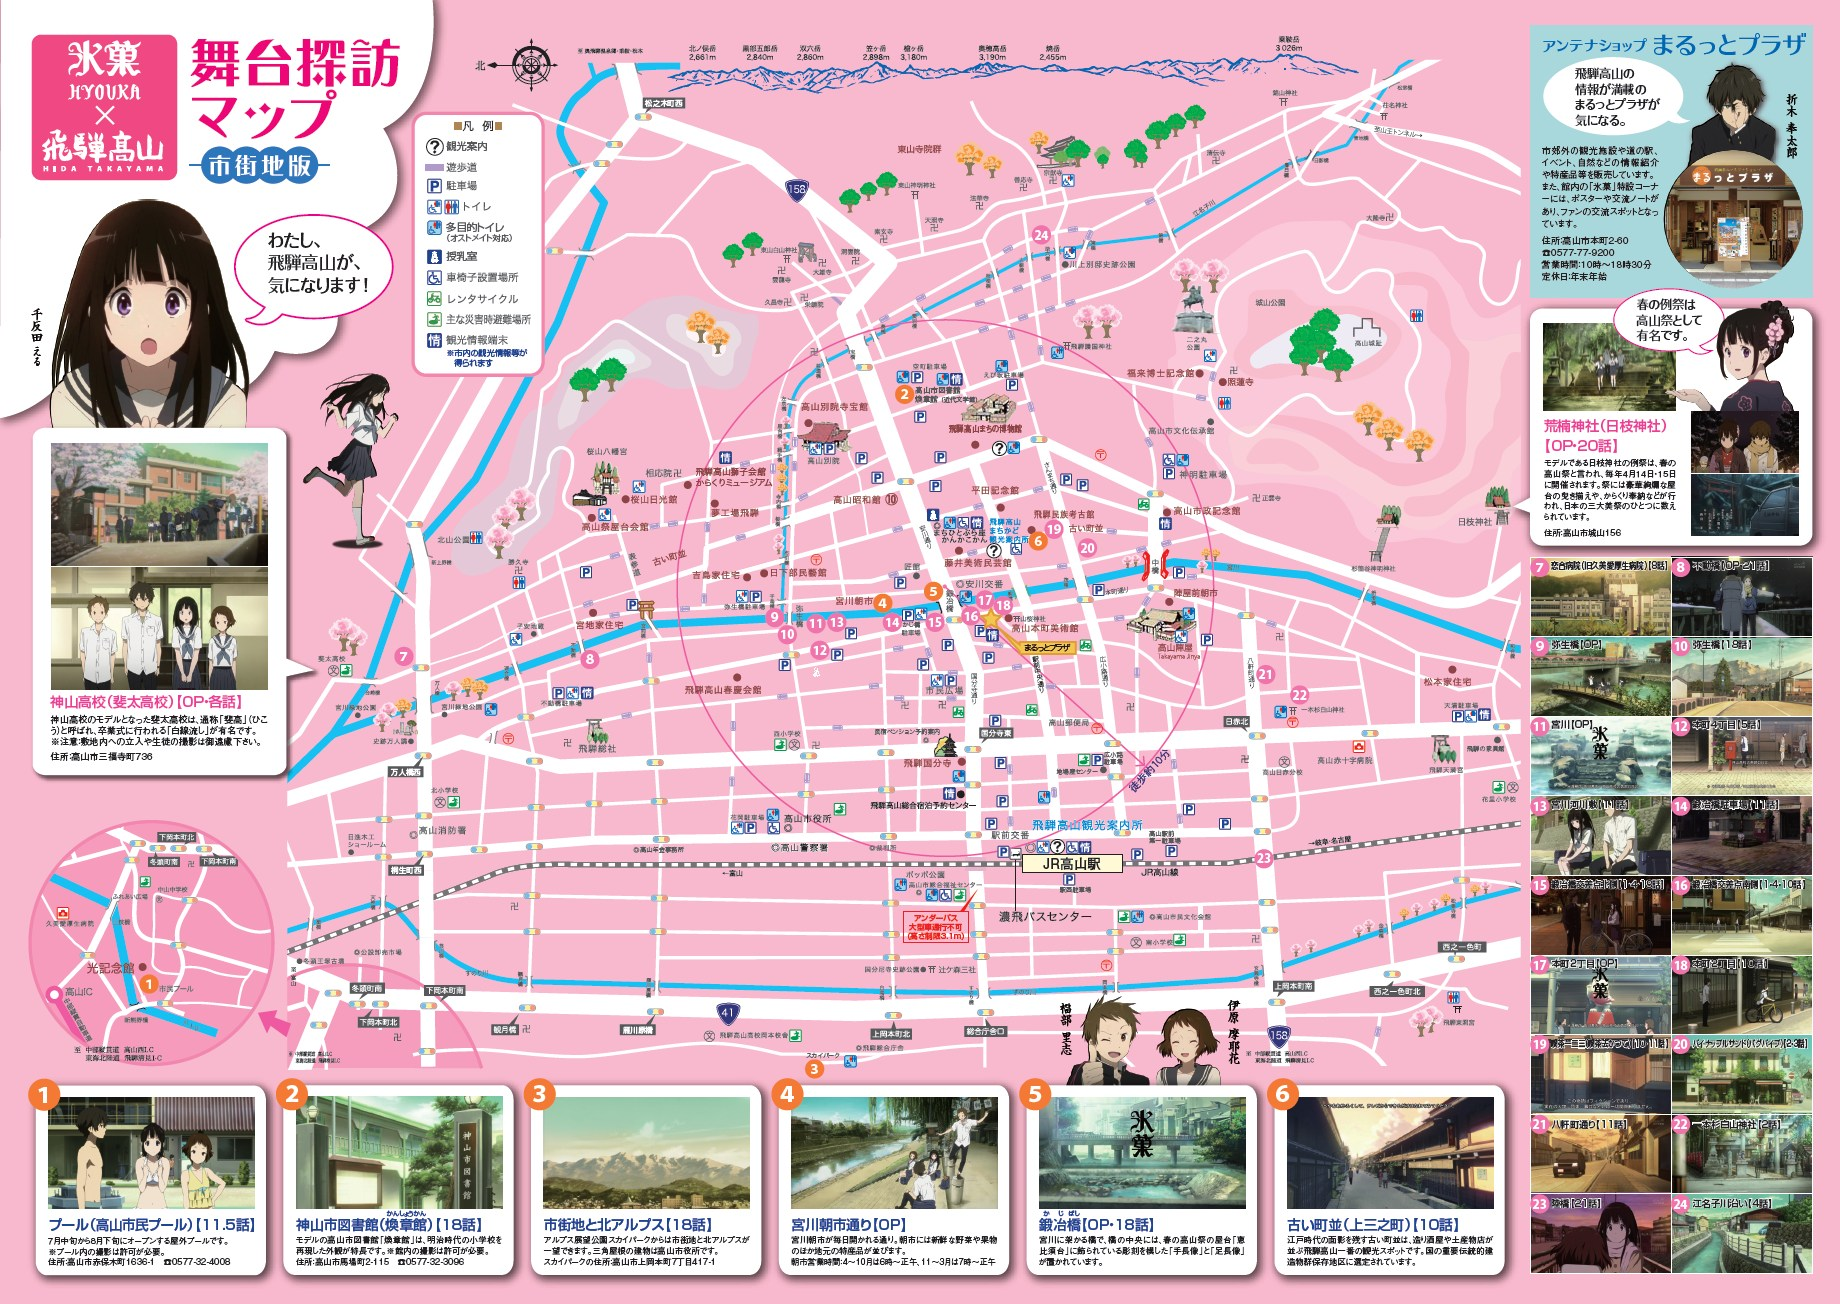 hyouka_map_b1.jpg